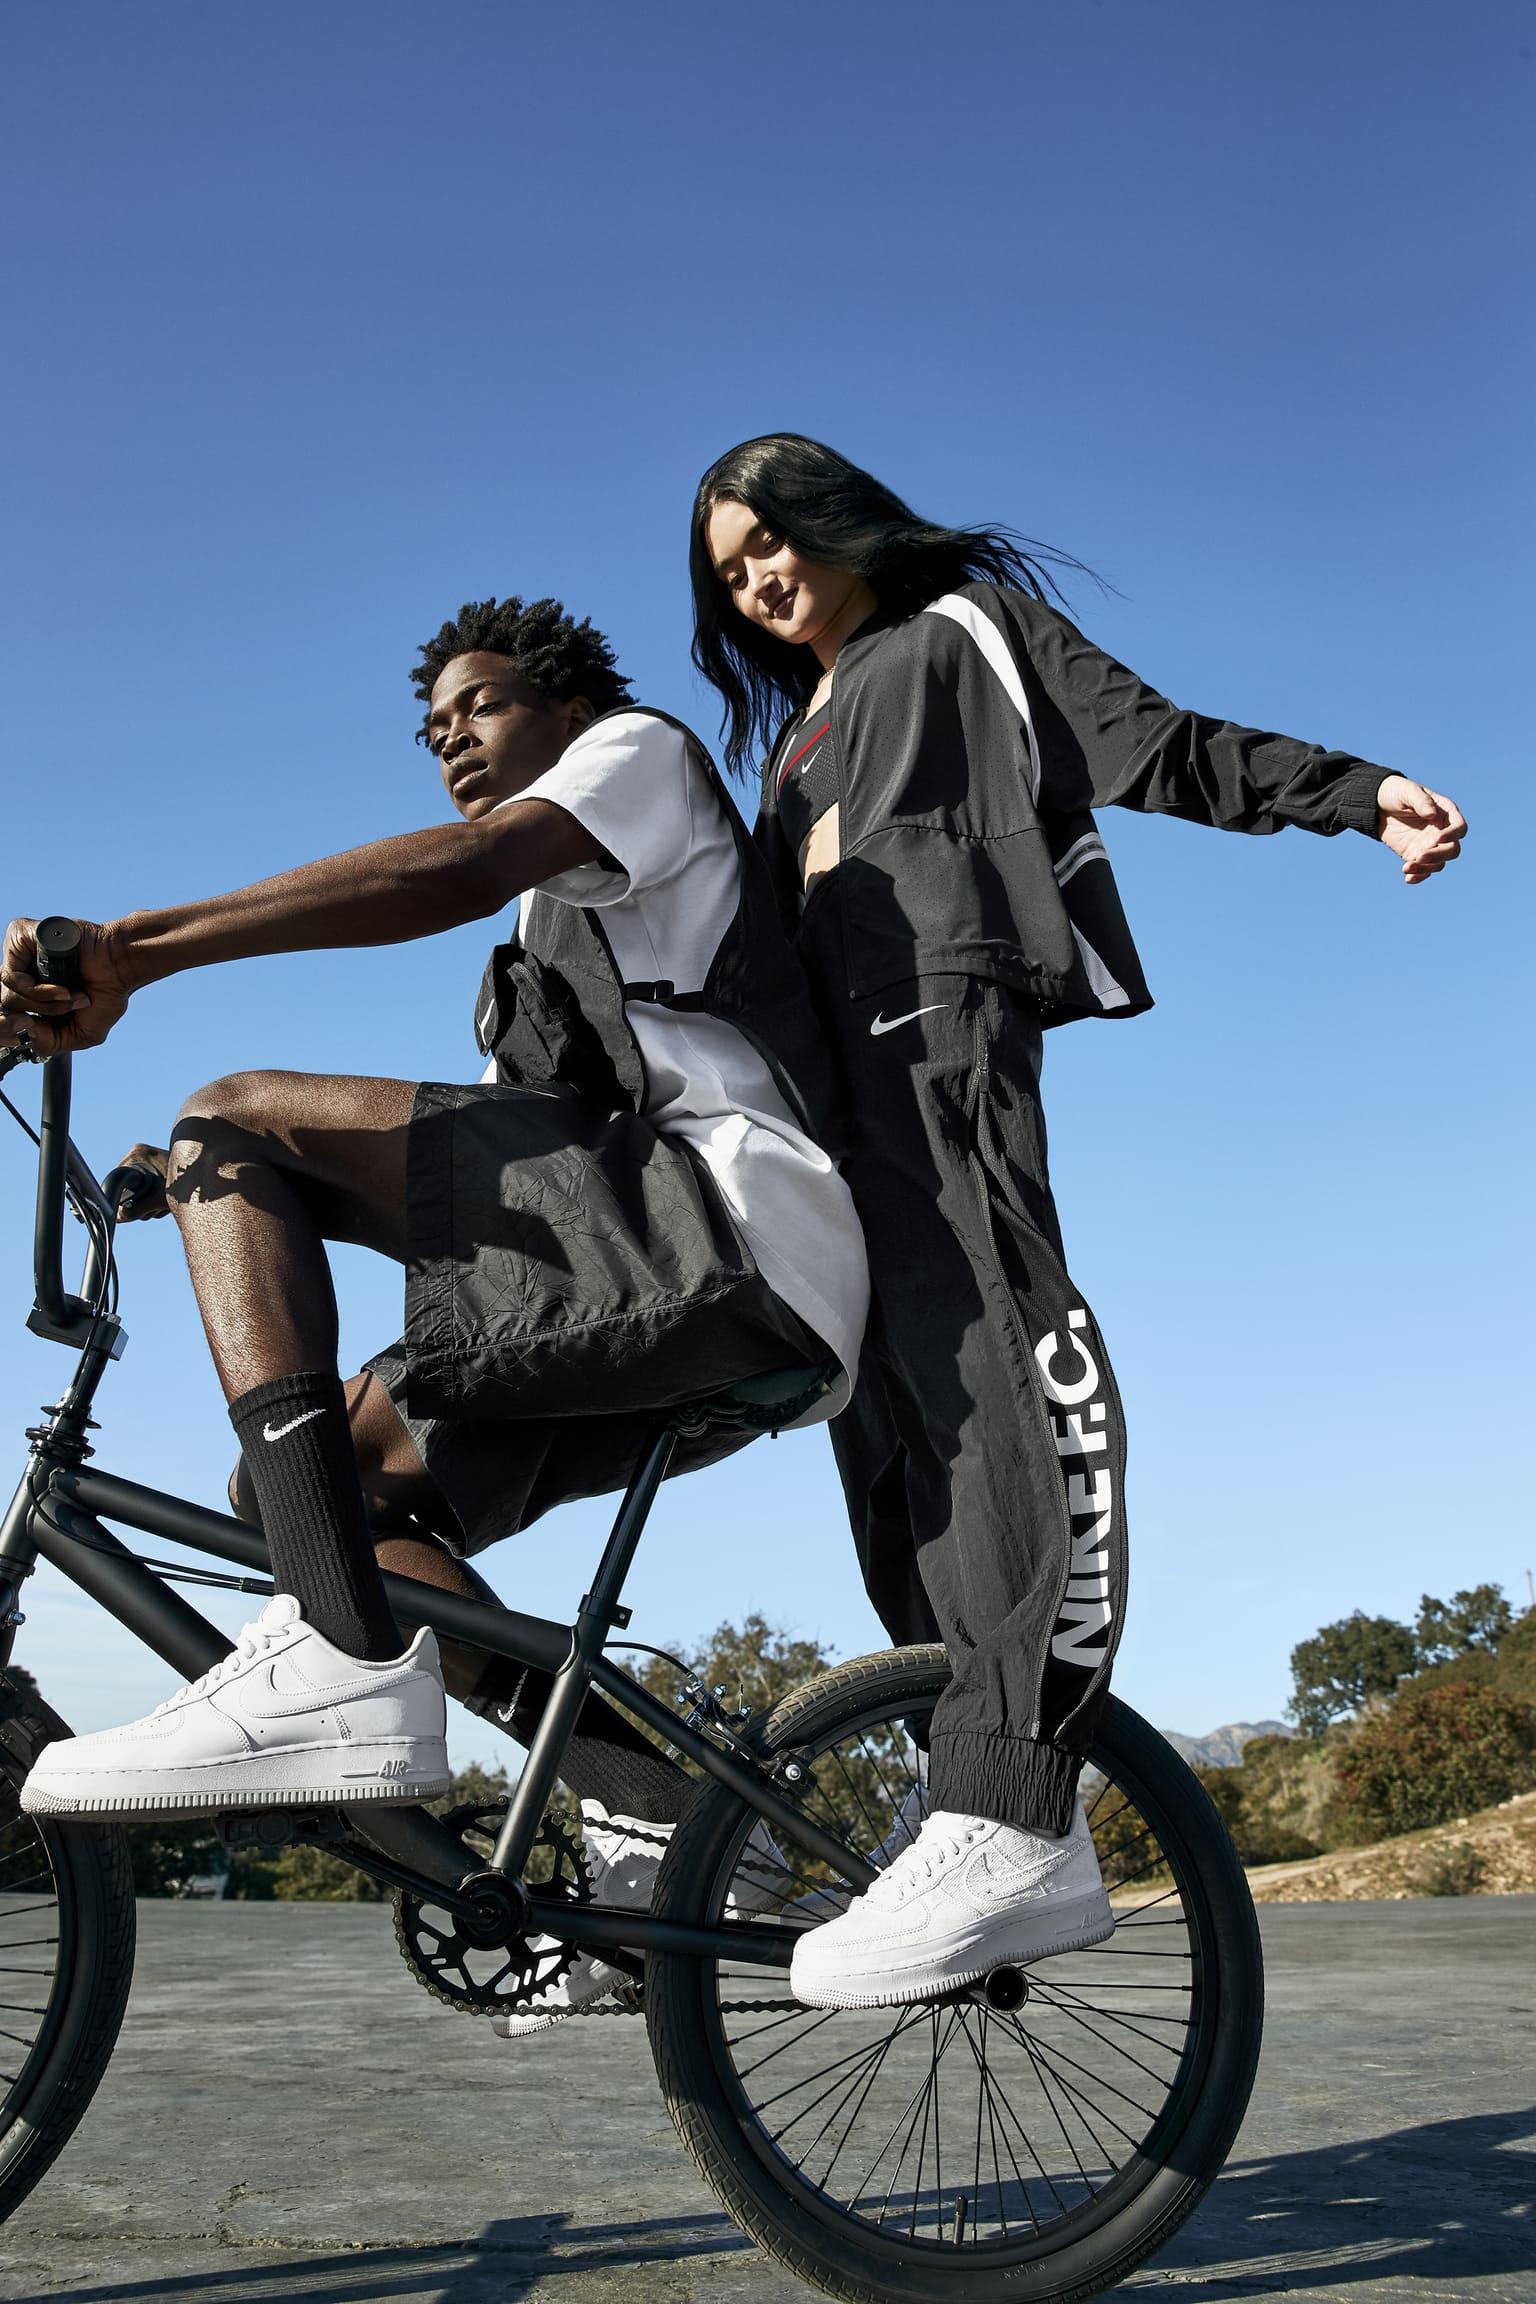 Humedal Persona arco  How Do I Track My Nike.Com Order Status? | Nike Help